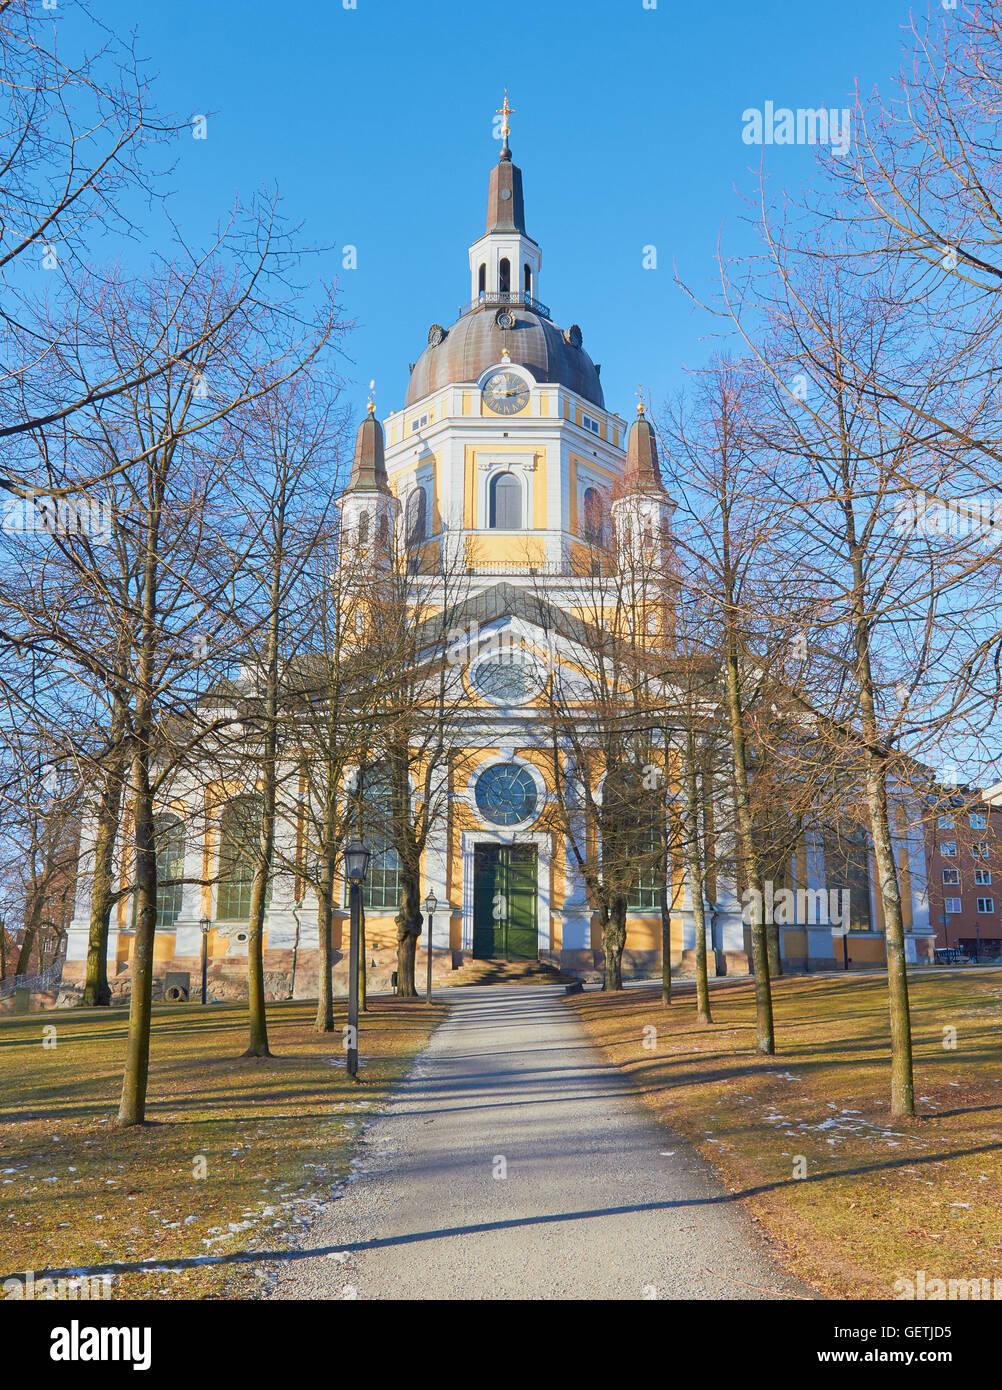 Katarina Kyrka (Church of Catherine) Sodermalm Stockholm Sweden Scandinavia Stock Photo